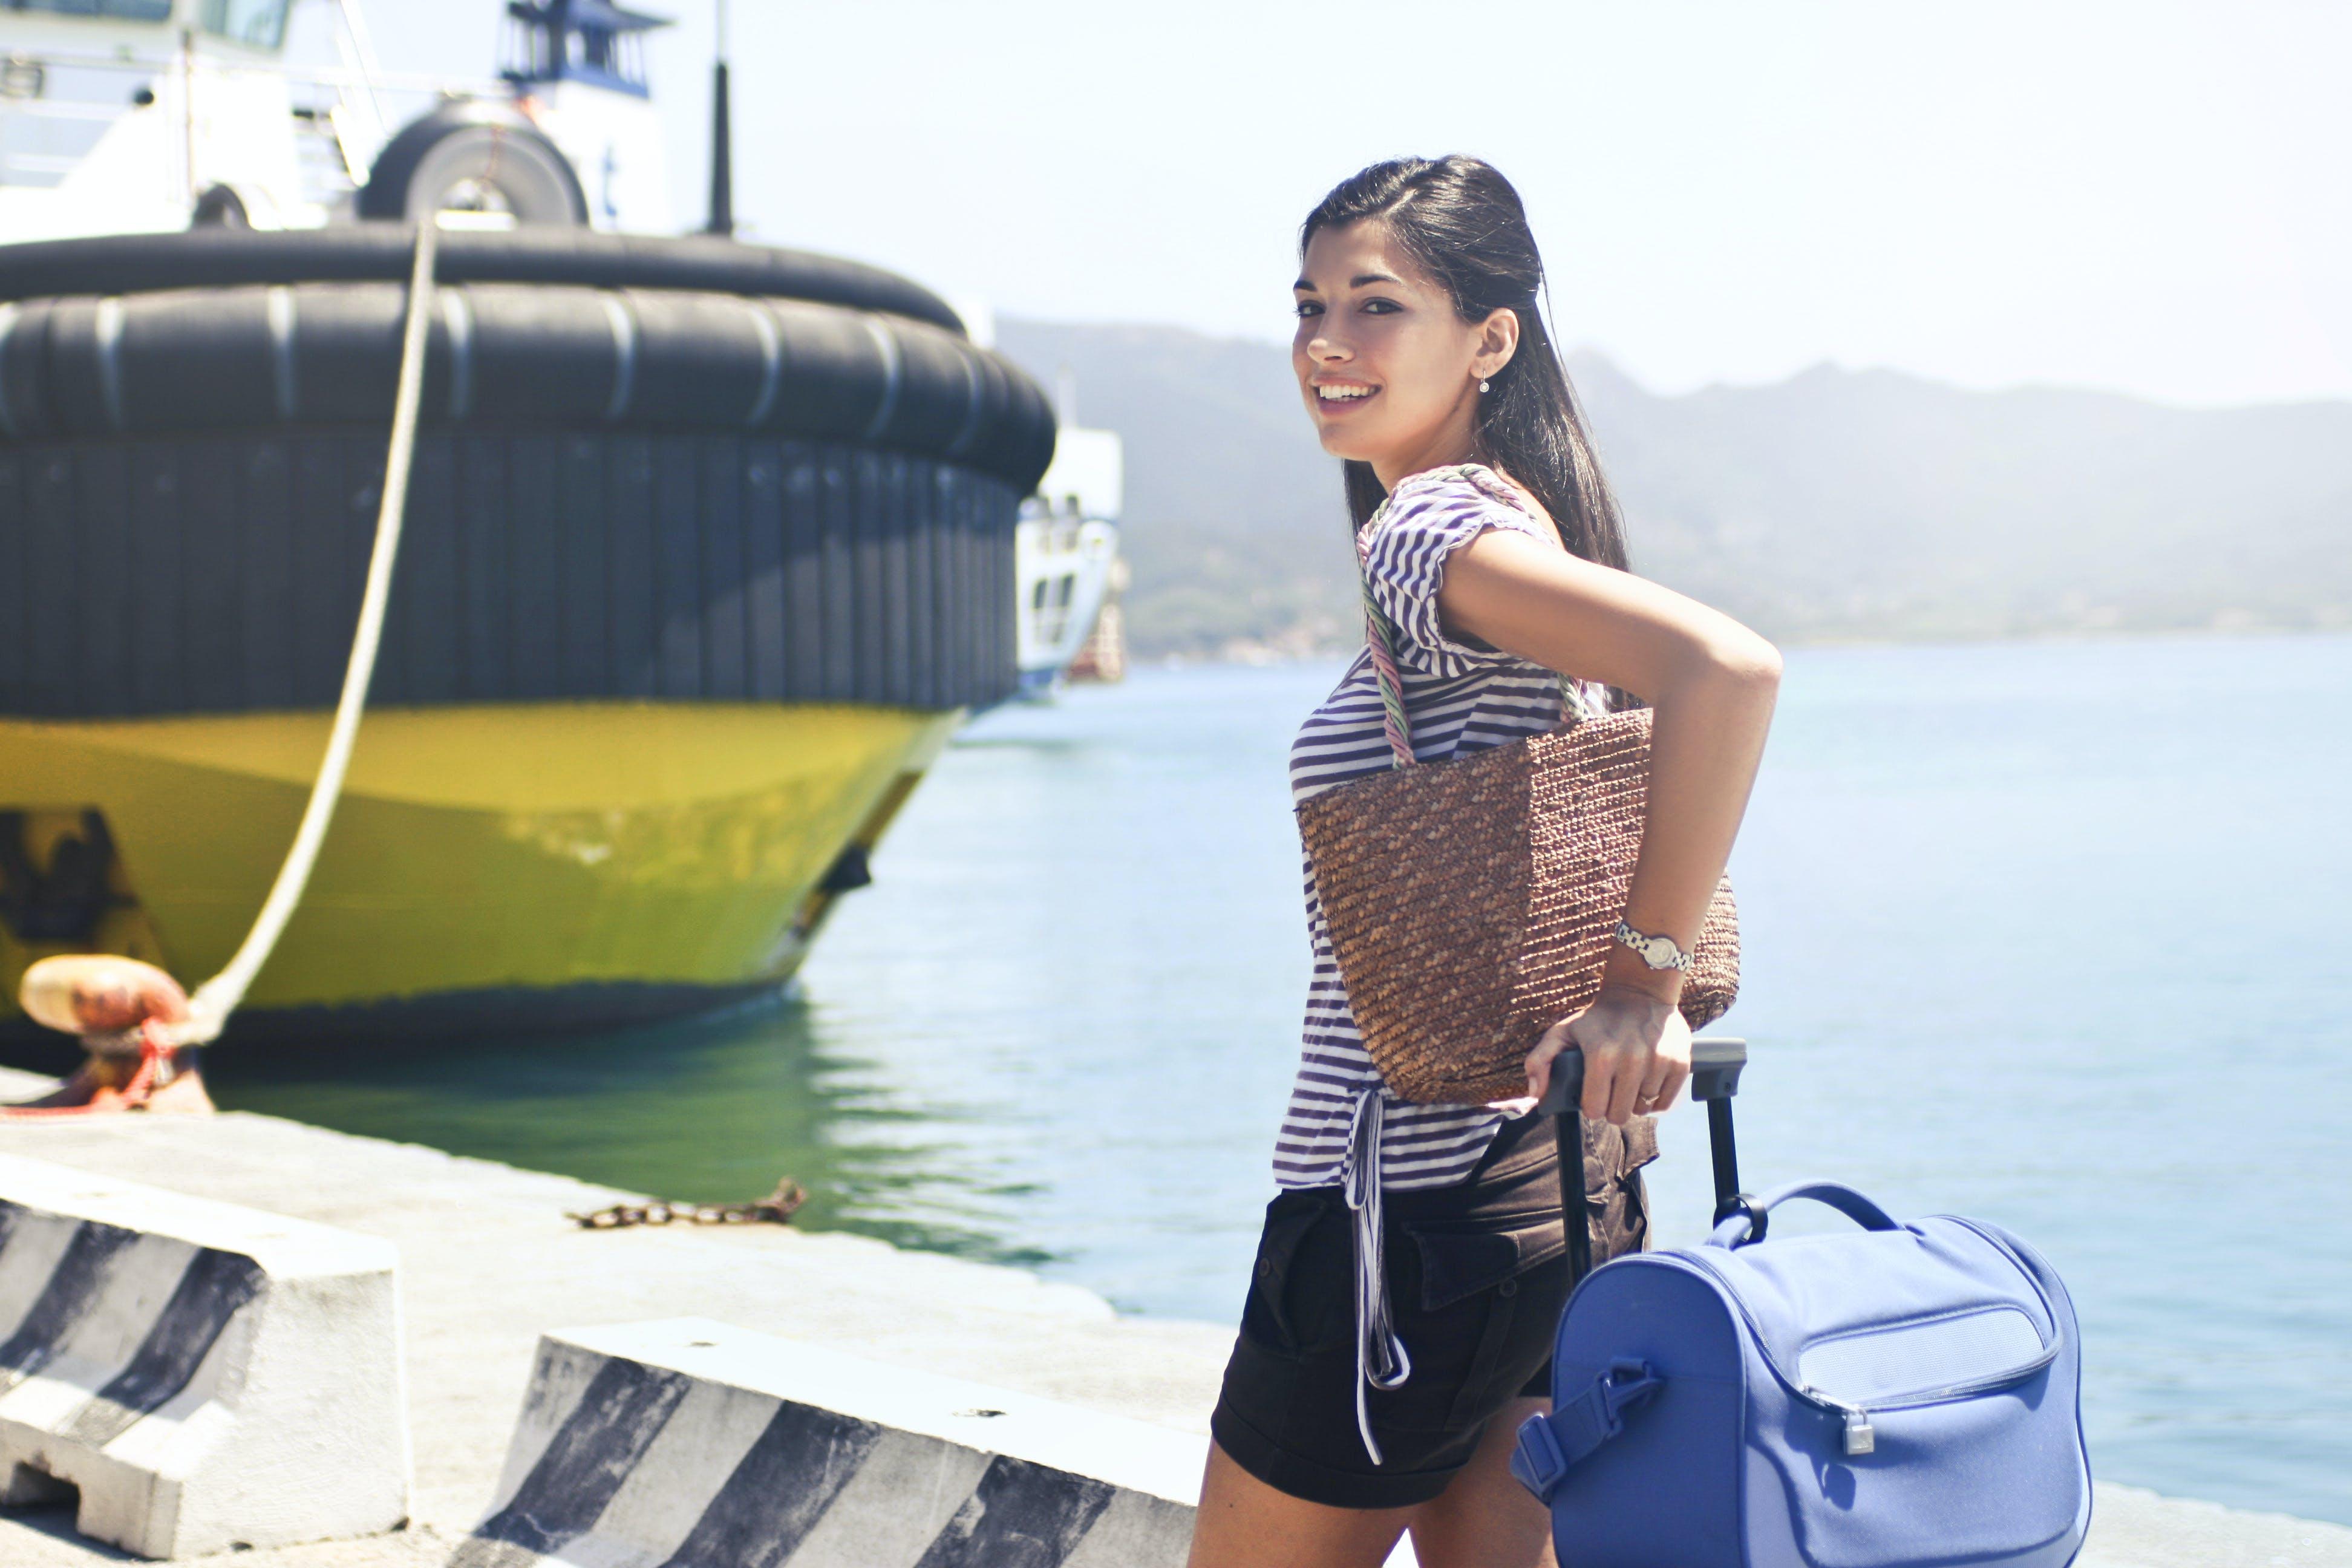 Woman Standing on Dock Near Ship Holding Luggage and Carrying Handbag